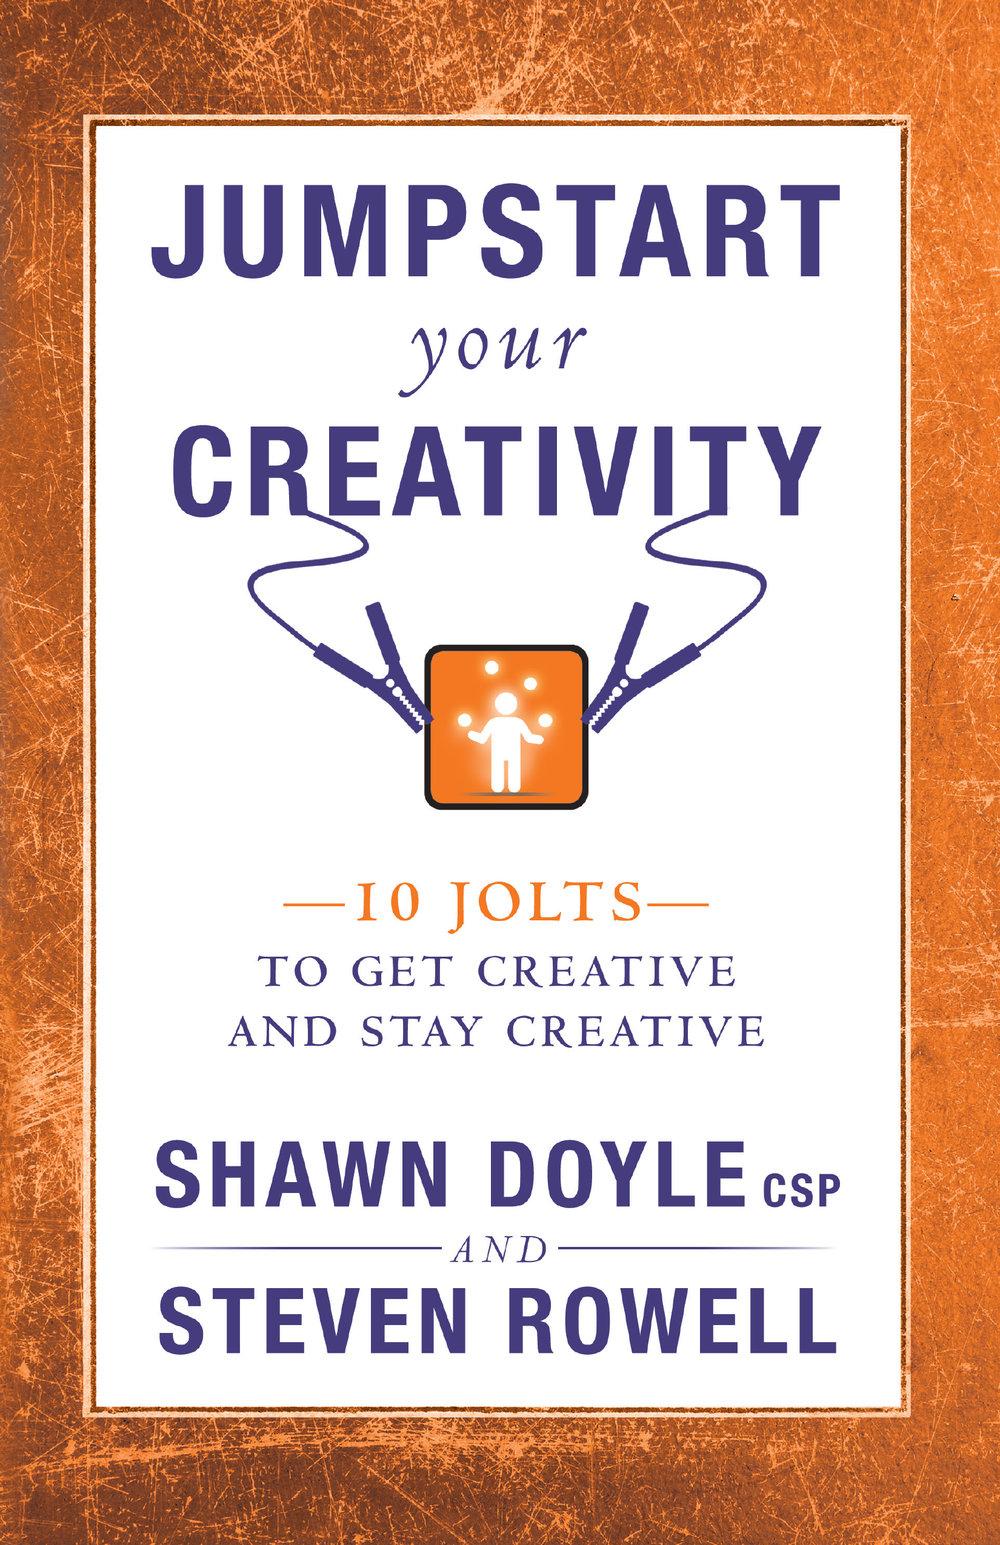 Jumpstart Your Creativity - Shawn Doyle CSP & Steven Rowell